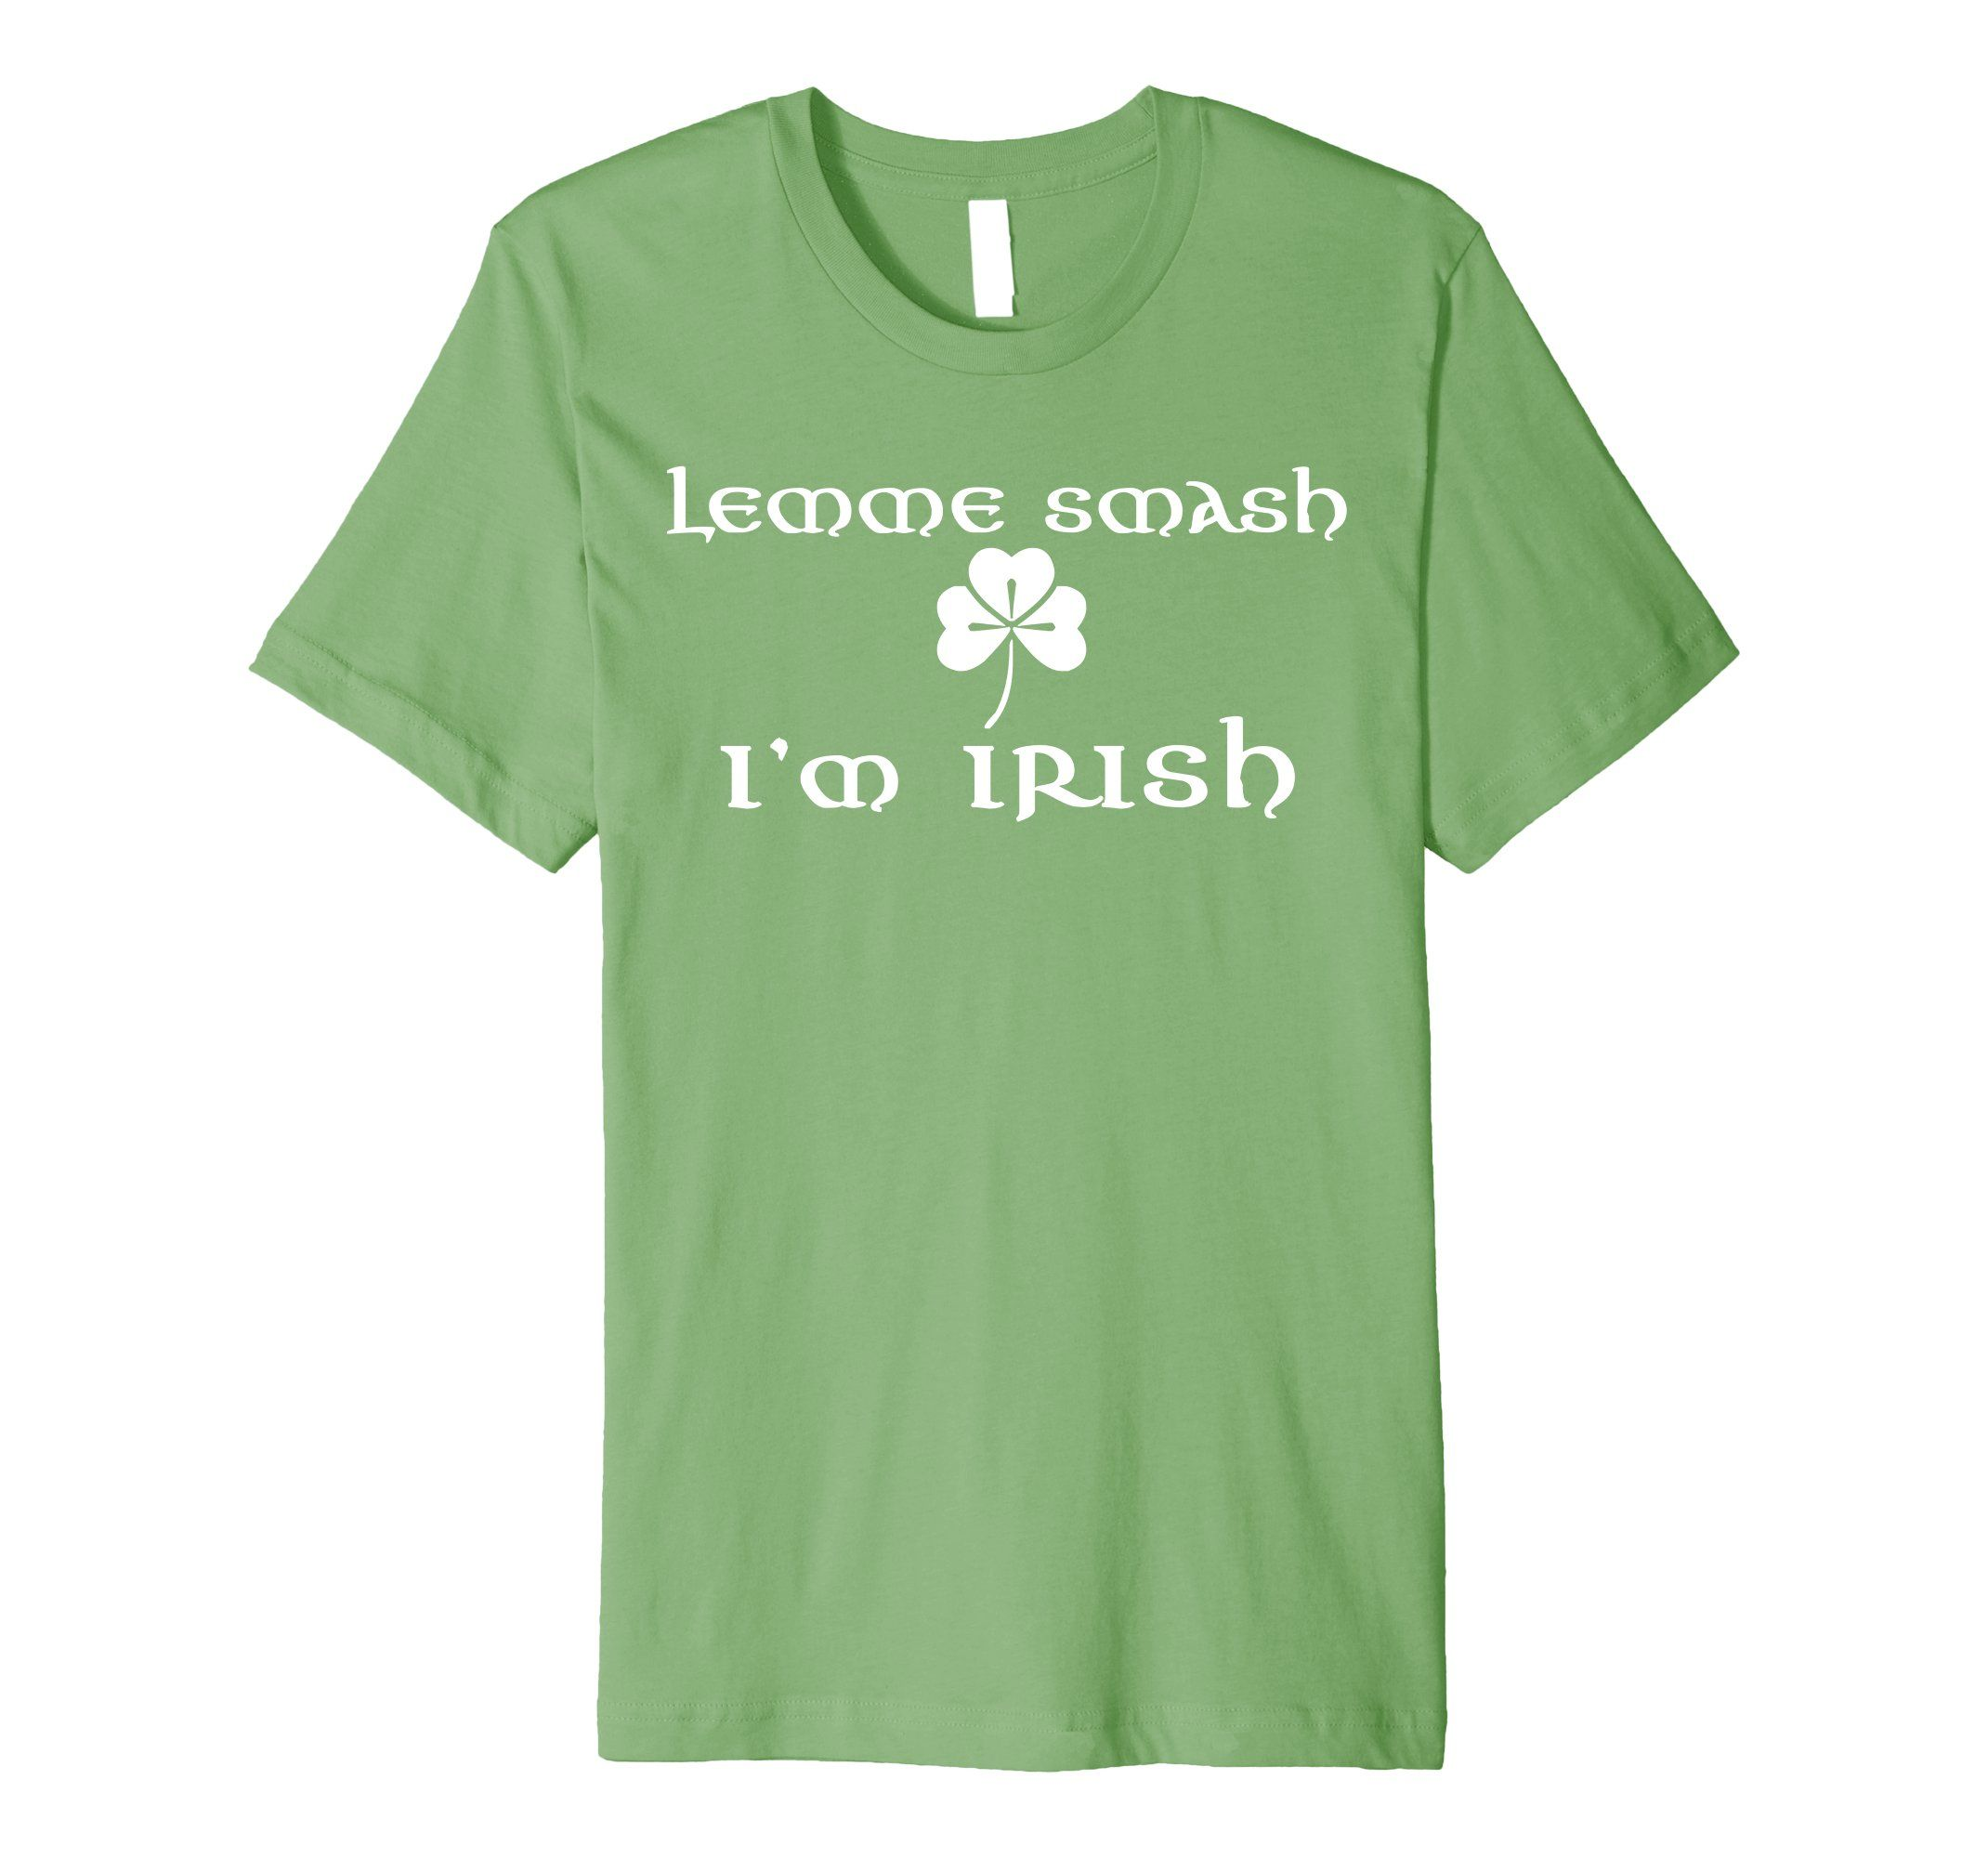 men/'s funny premium t-shirt I/'m perfect